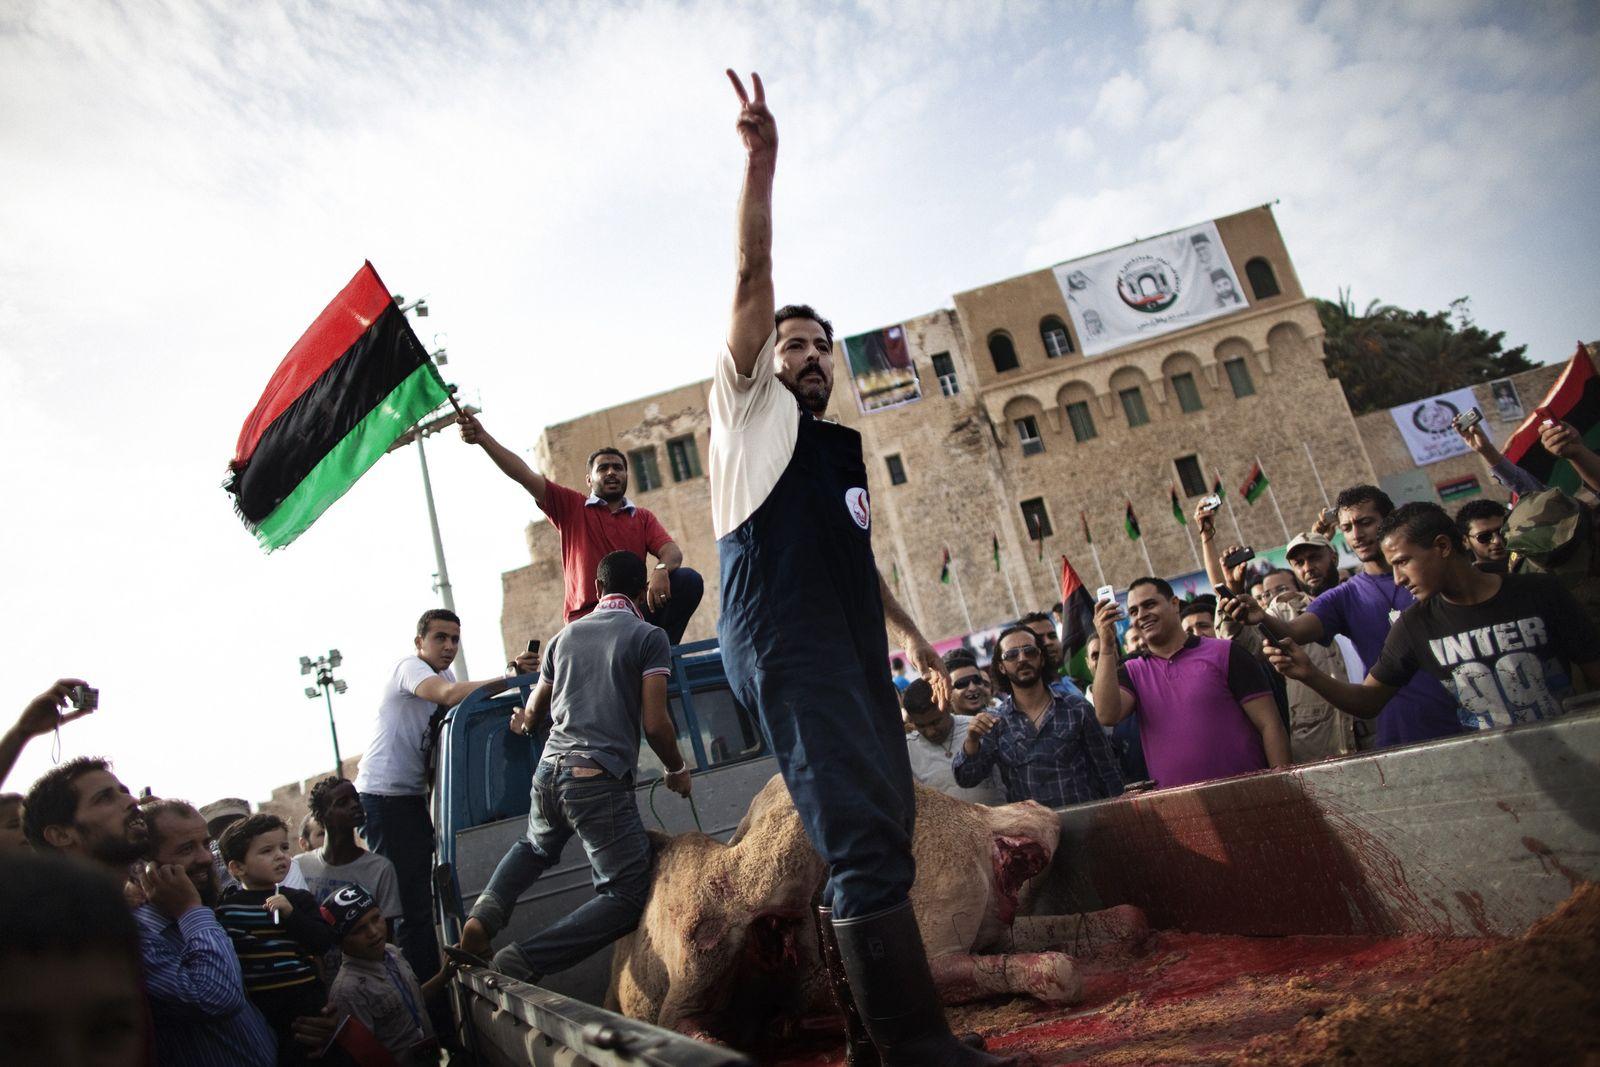 LIBYA-CONFLICT-LIBERATION